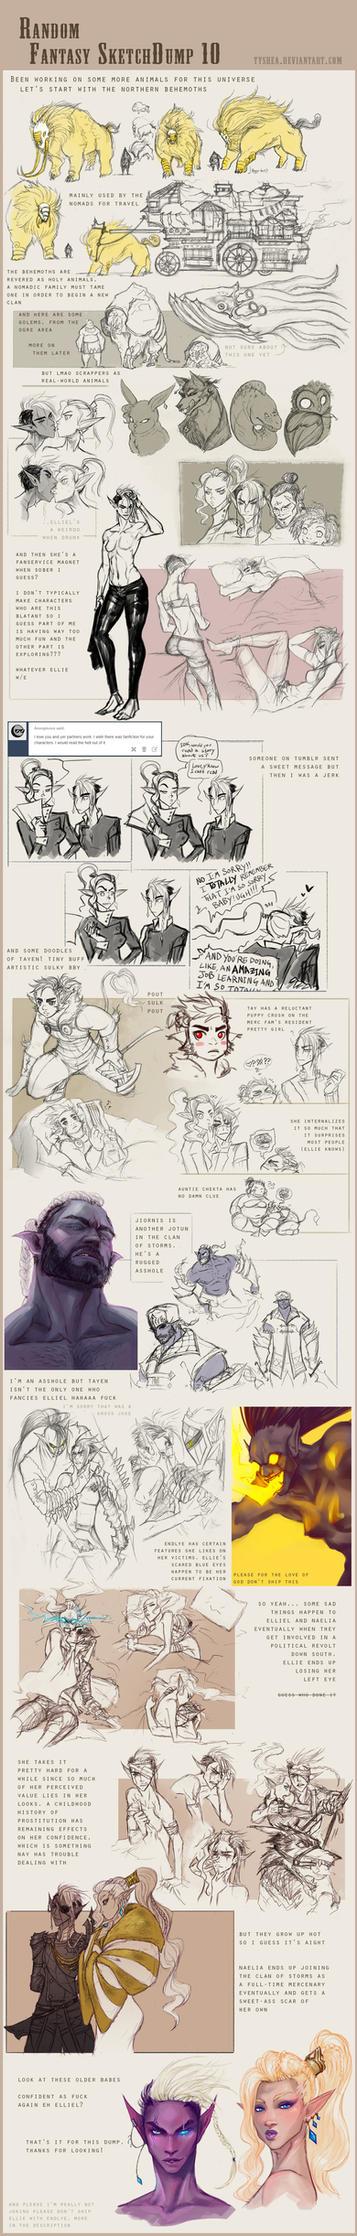 Fantasy Sketchdump 10 by Dyemelikeasunset